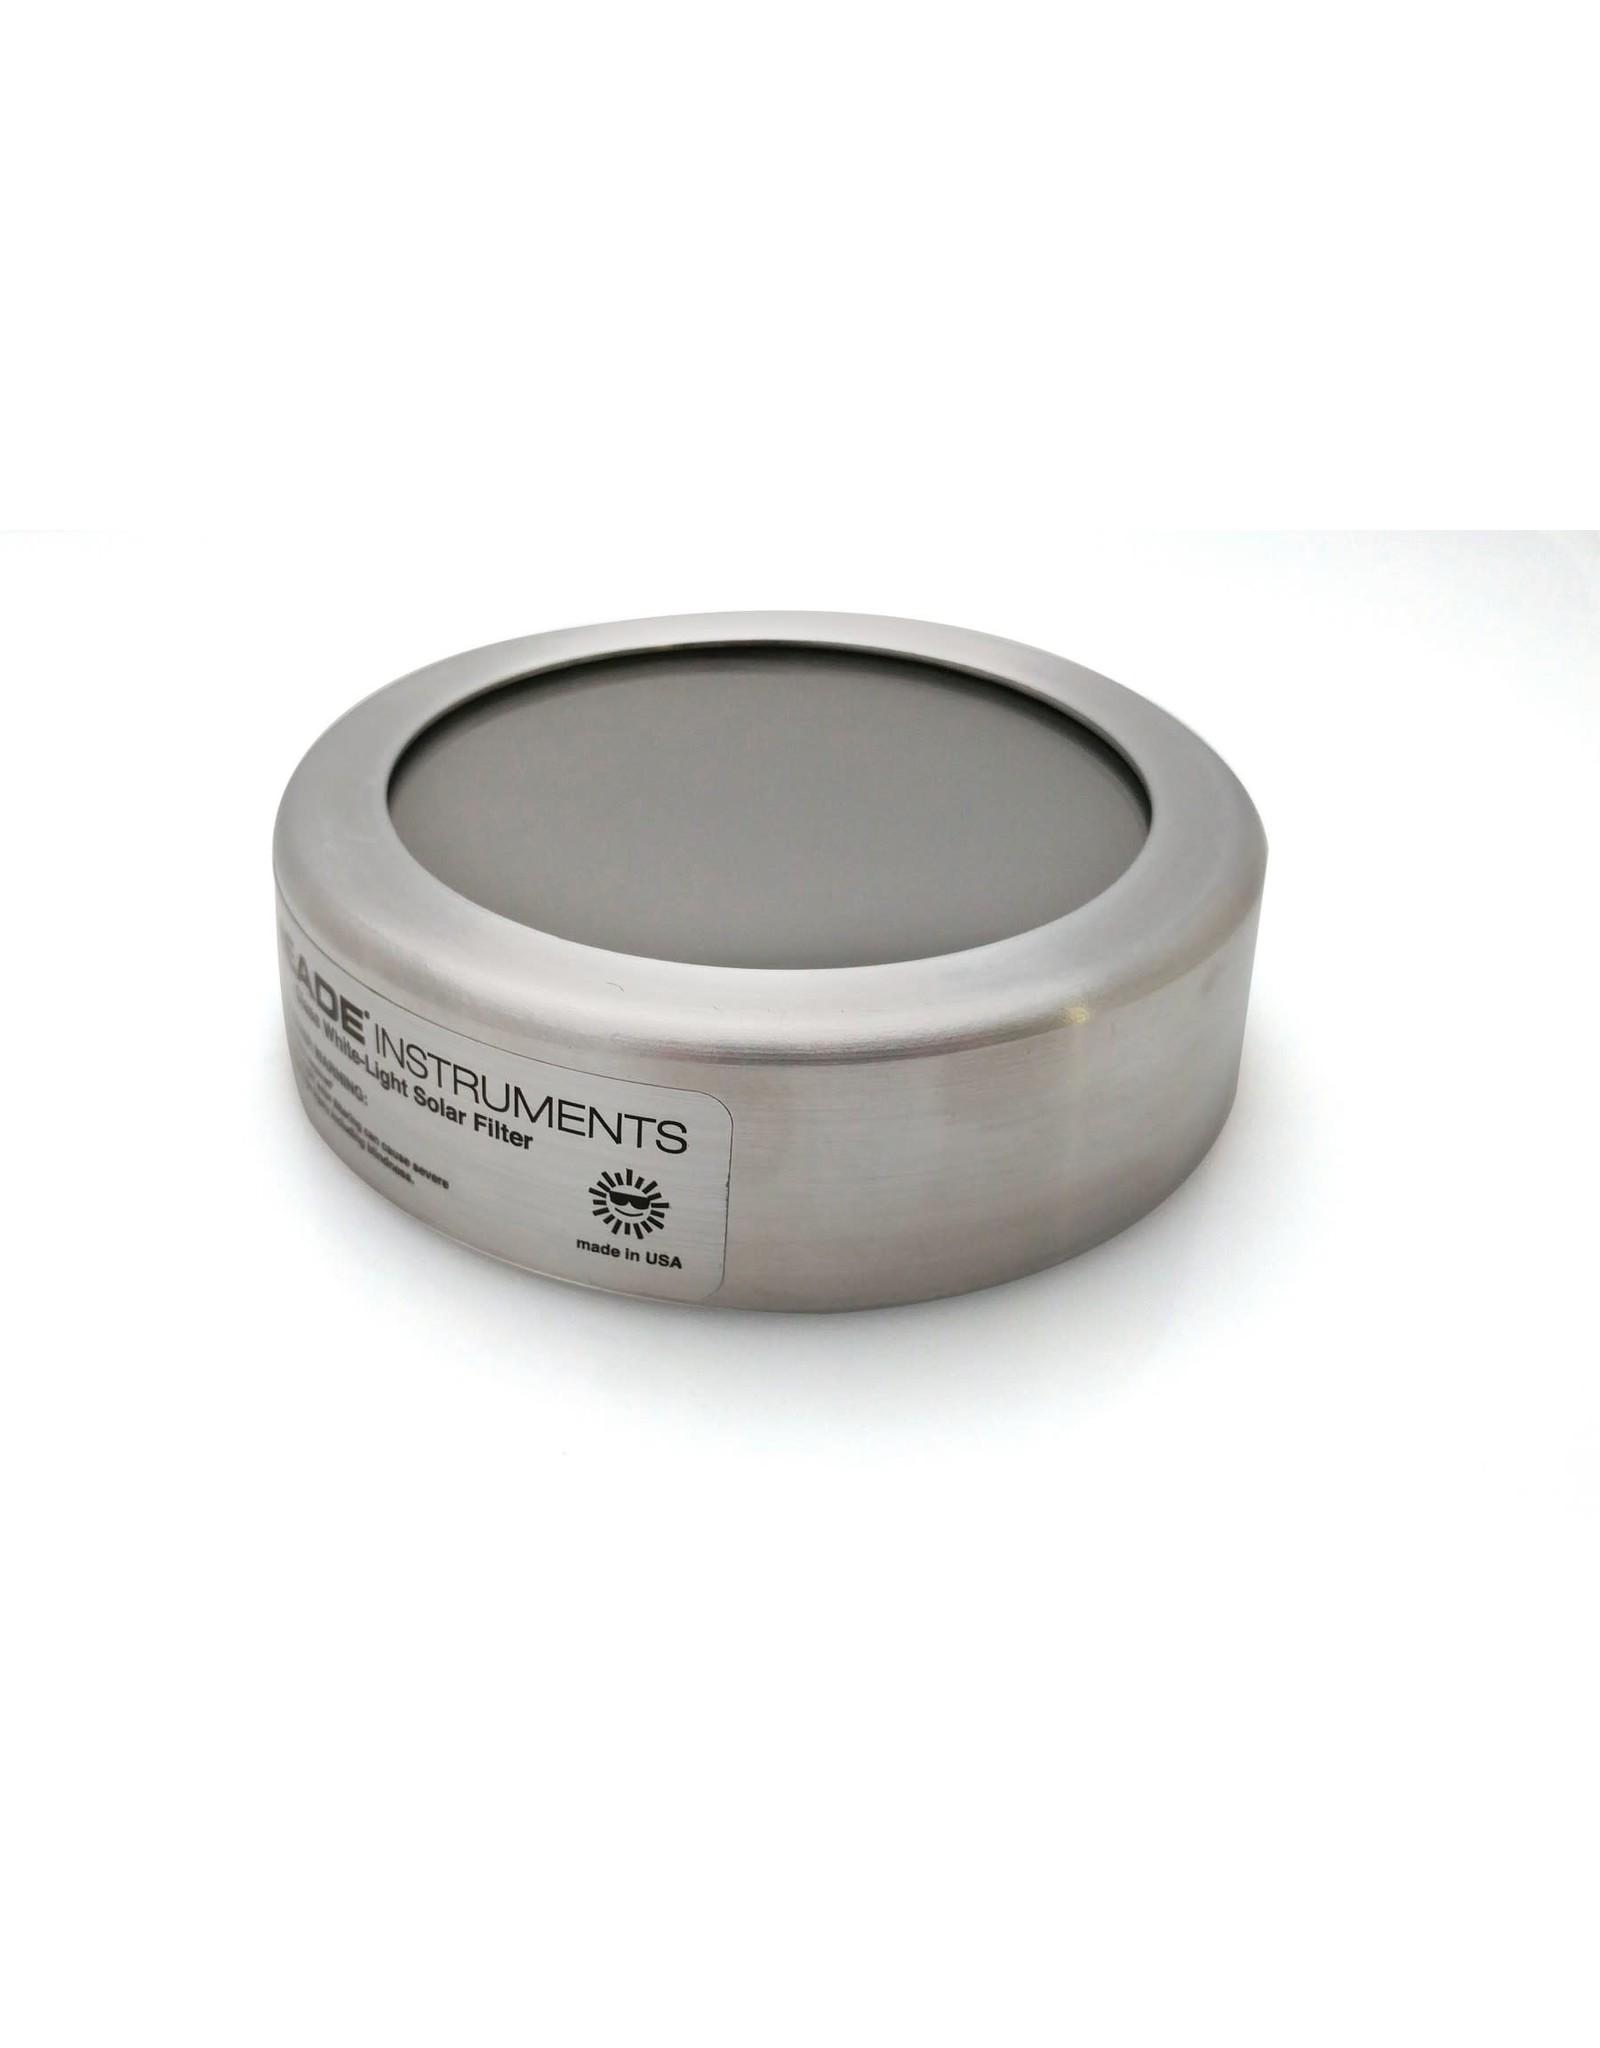 Meade Meade Glass White-Light Solar Filter #500 (ID 127mm)